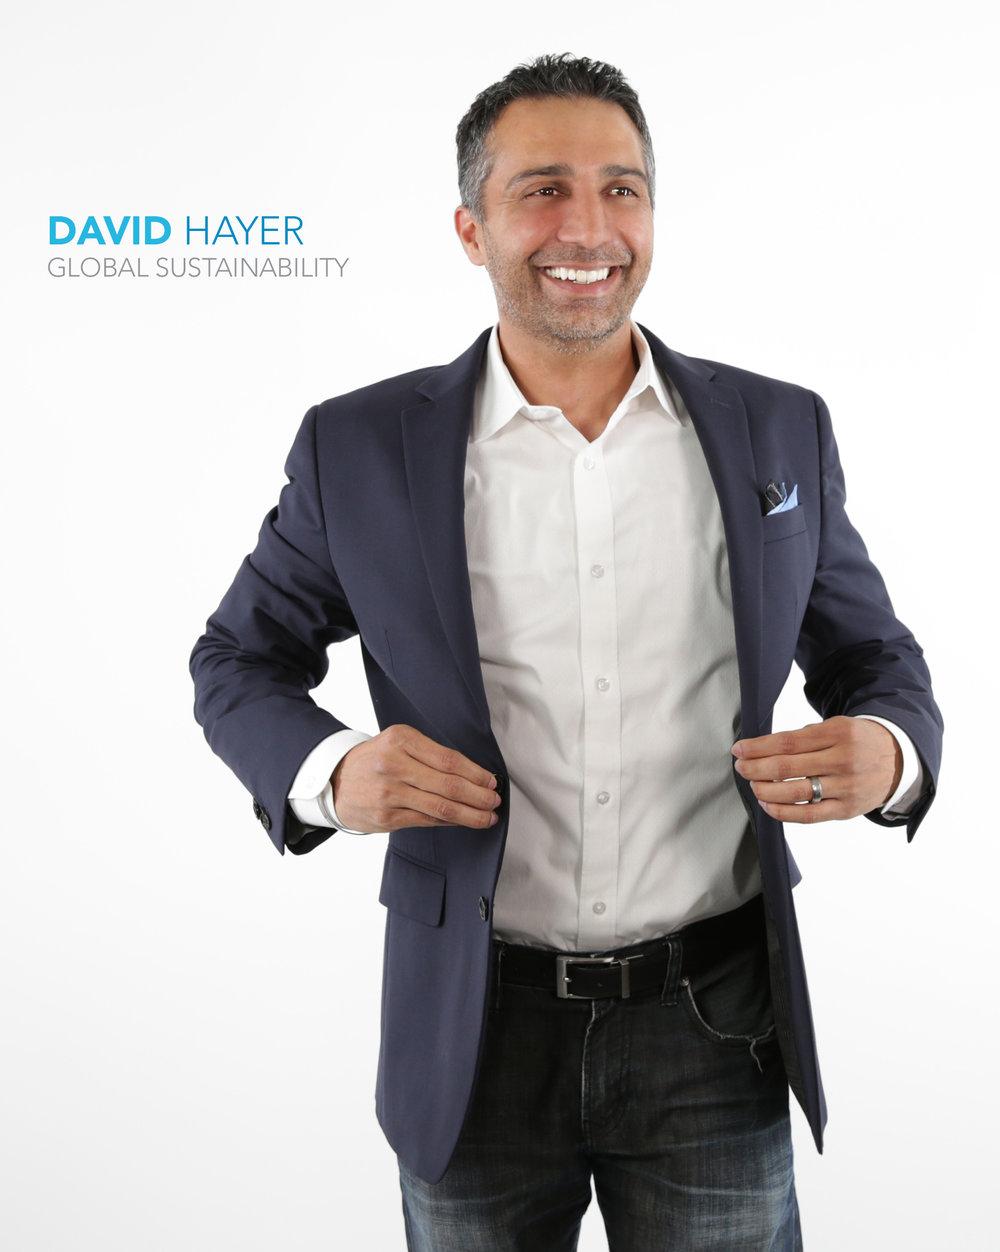 David Hayer Gap Inc EVP Global Sustainability.jpg